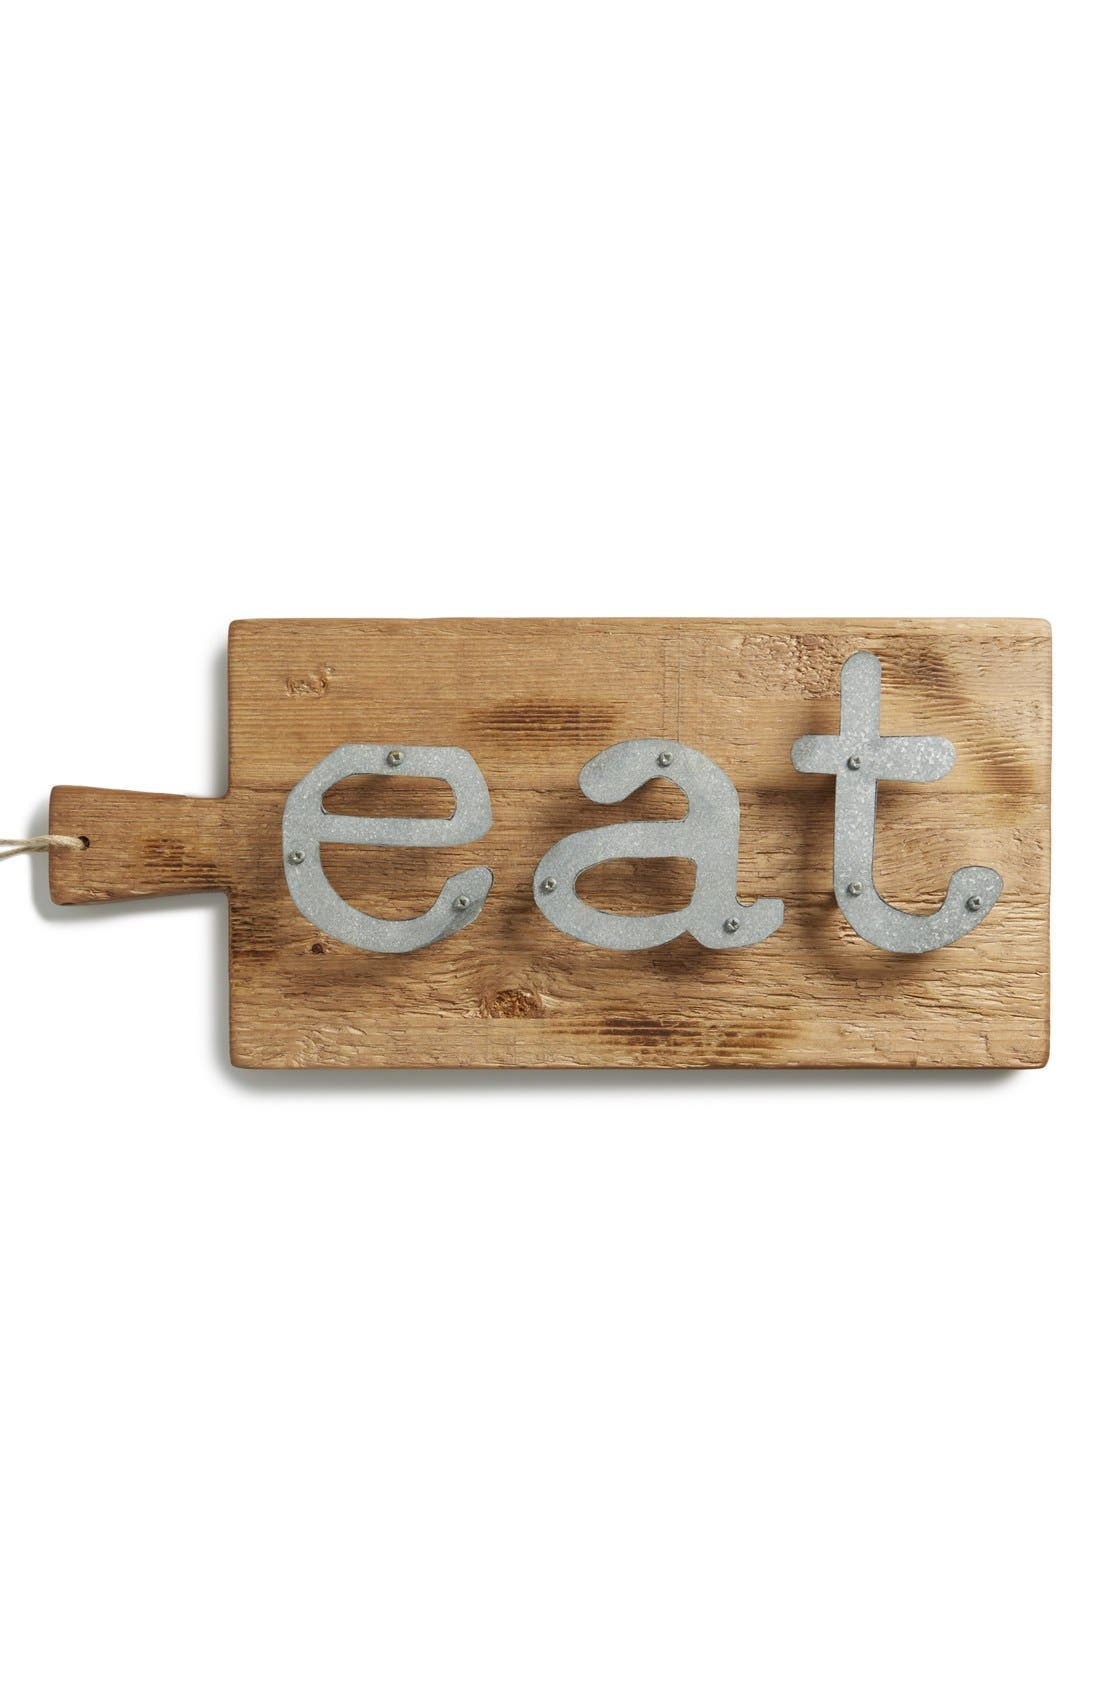 Main Image - Europe2You 'Eat' Reclaimed Wood Wall Art